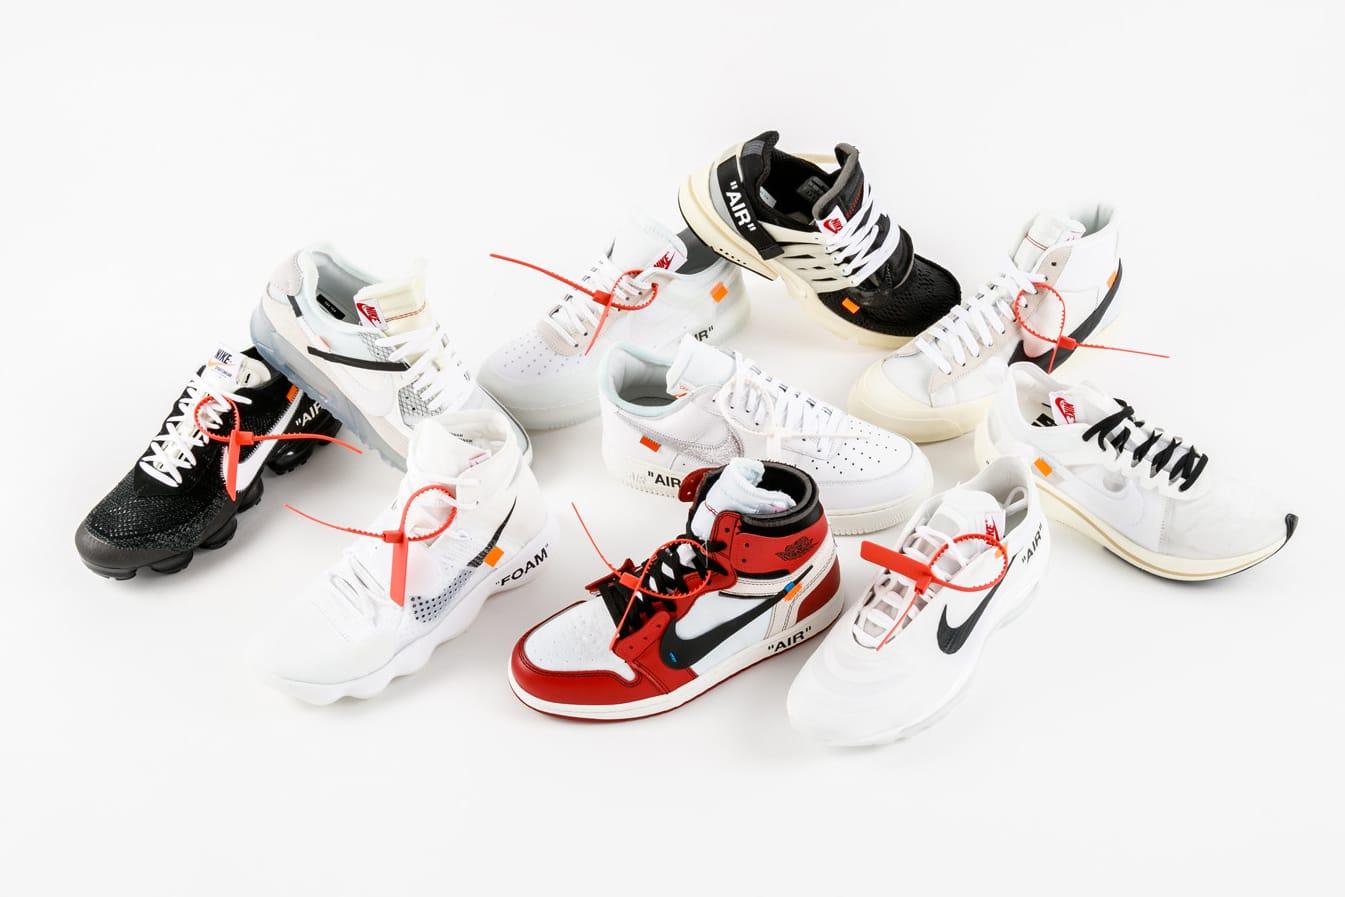 Brands Make Sneakers in Women's Sizes